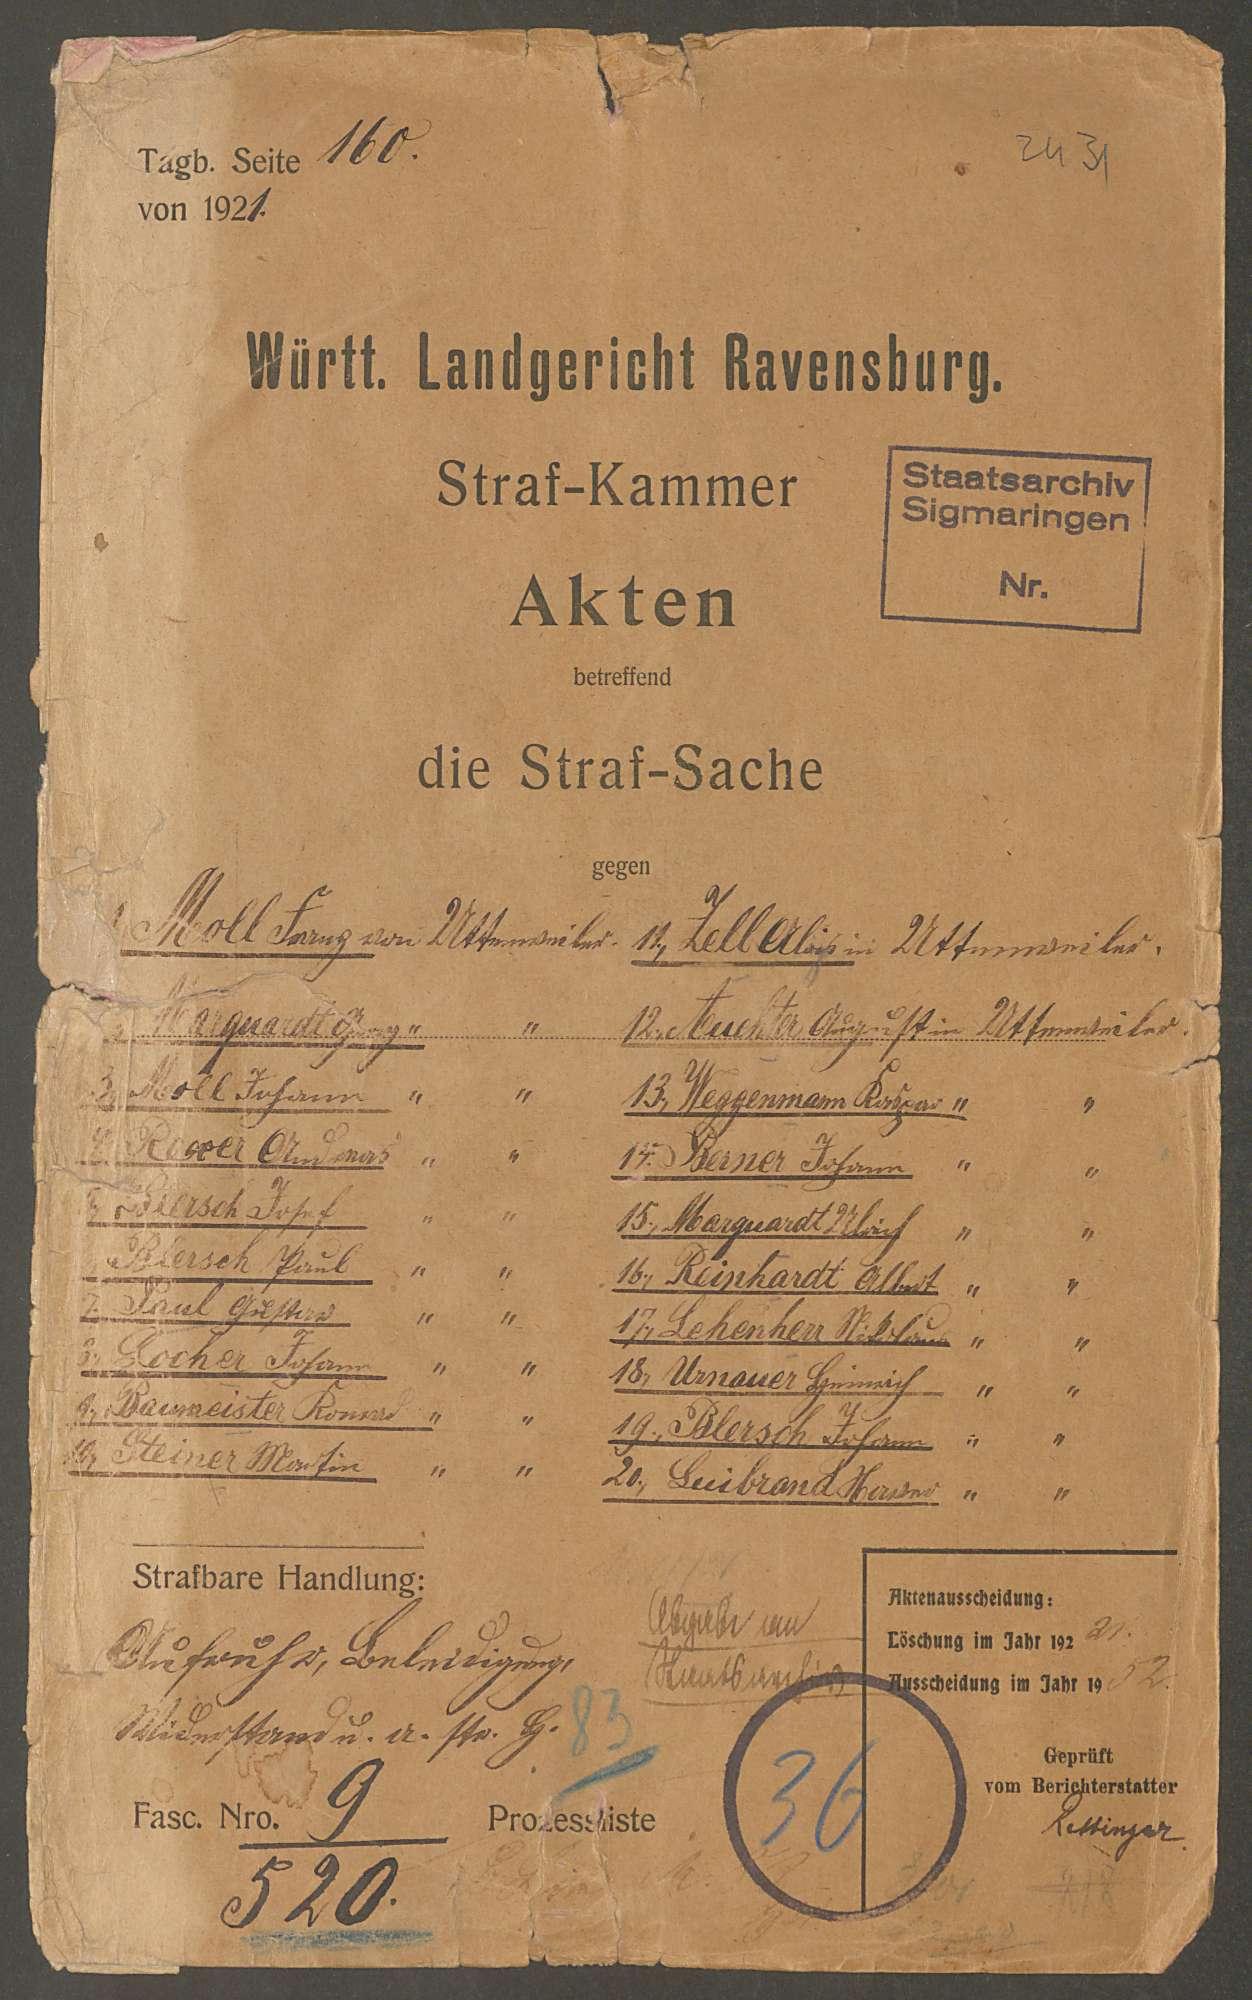 Moll, Franz, Bild 1